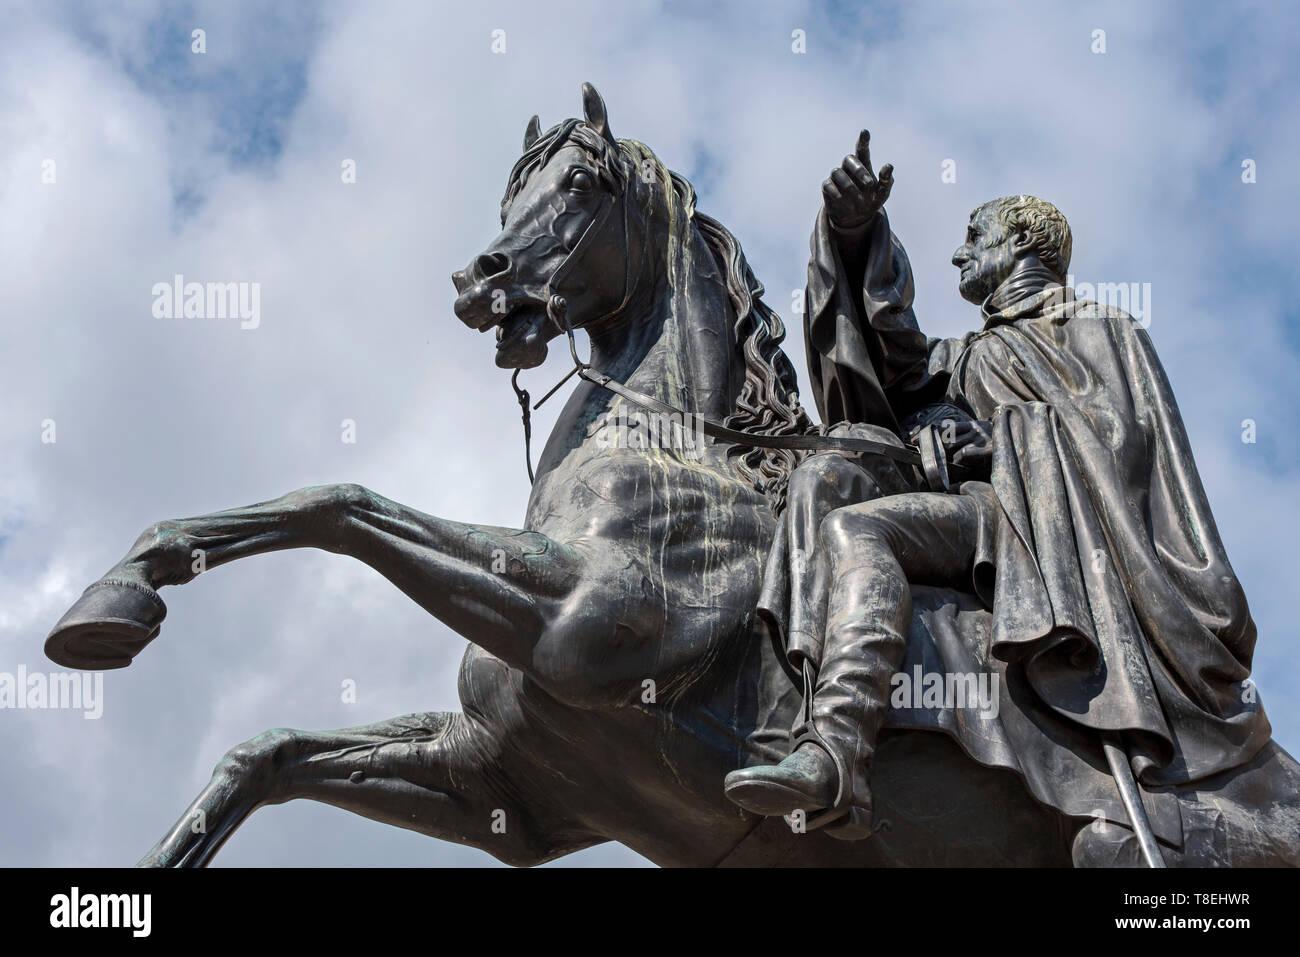 The statue of the Duke of Wellington at the East End of Princes Street, Edinburgh, Scotland, UK. - Stock Image